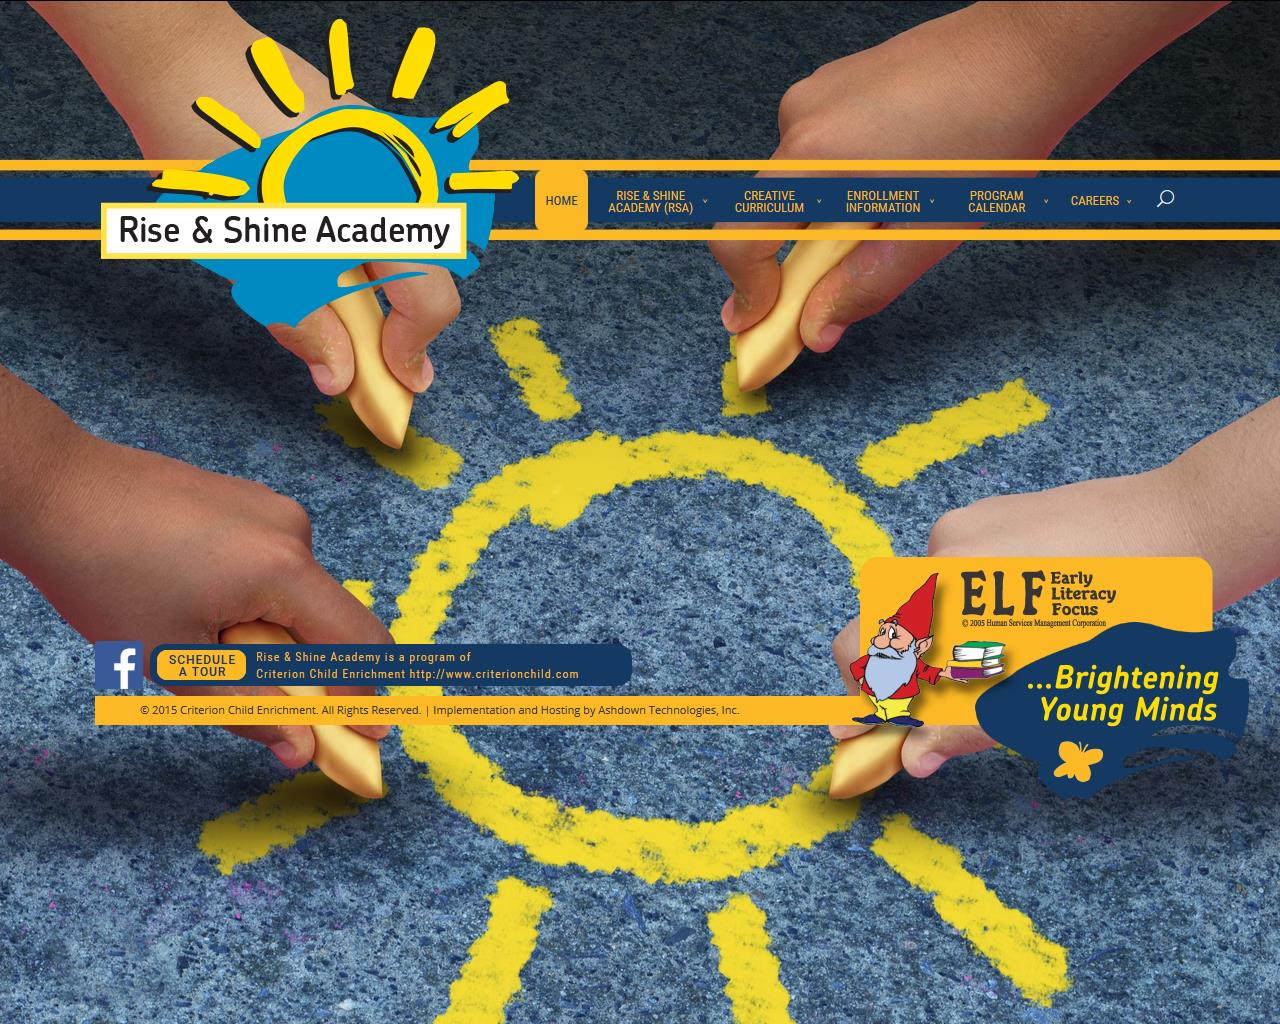 Rise & Shine Academy